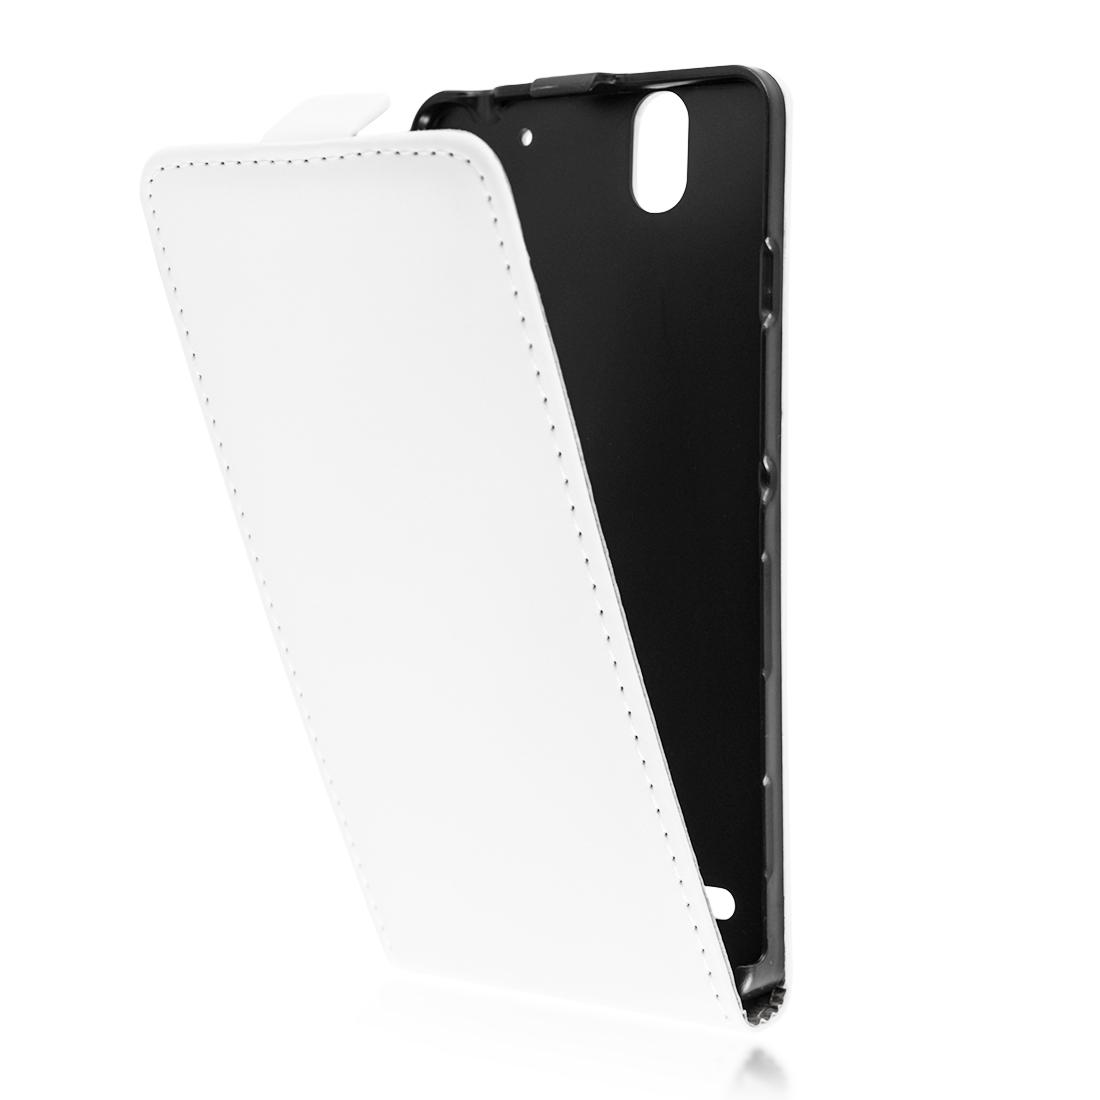 Чехол флиппер Brosco для Xperia C4 белого цвета купить в Sony Centre